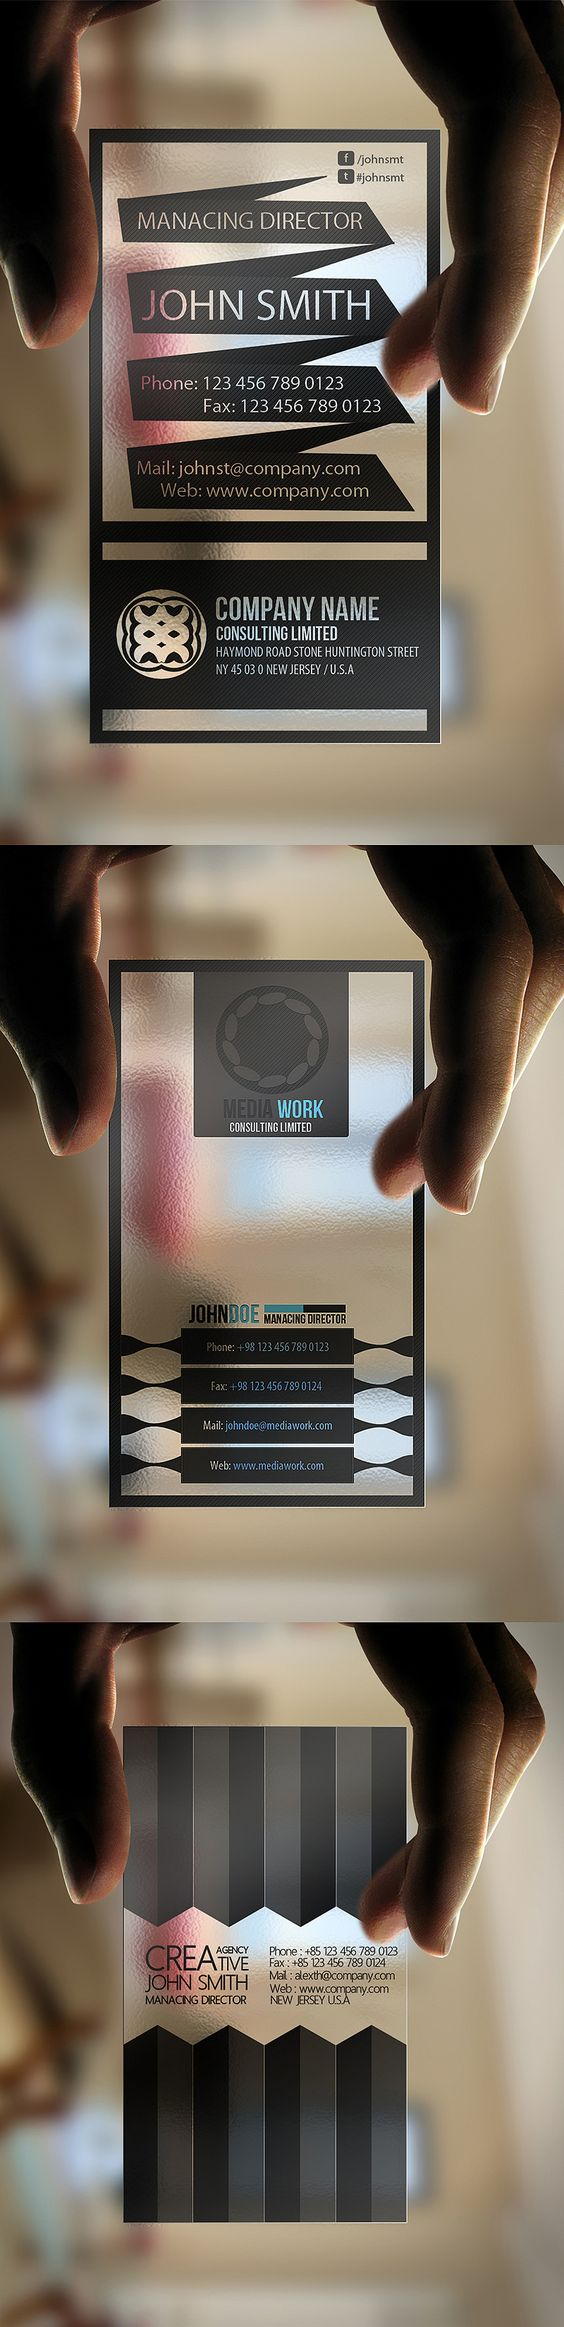 carte de visite translucide en plastique